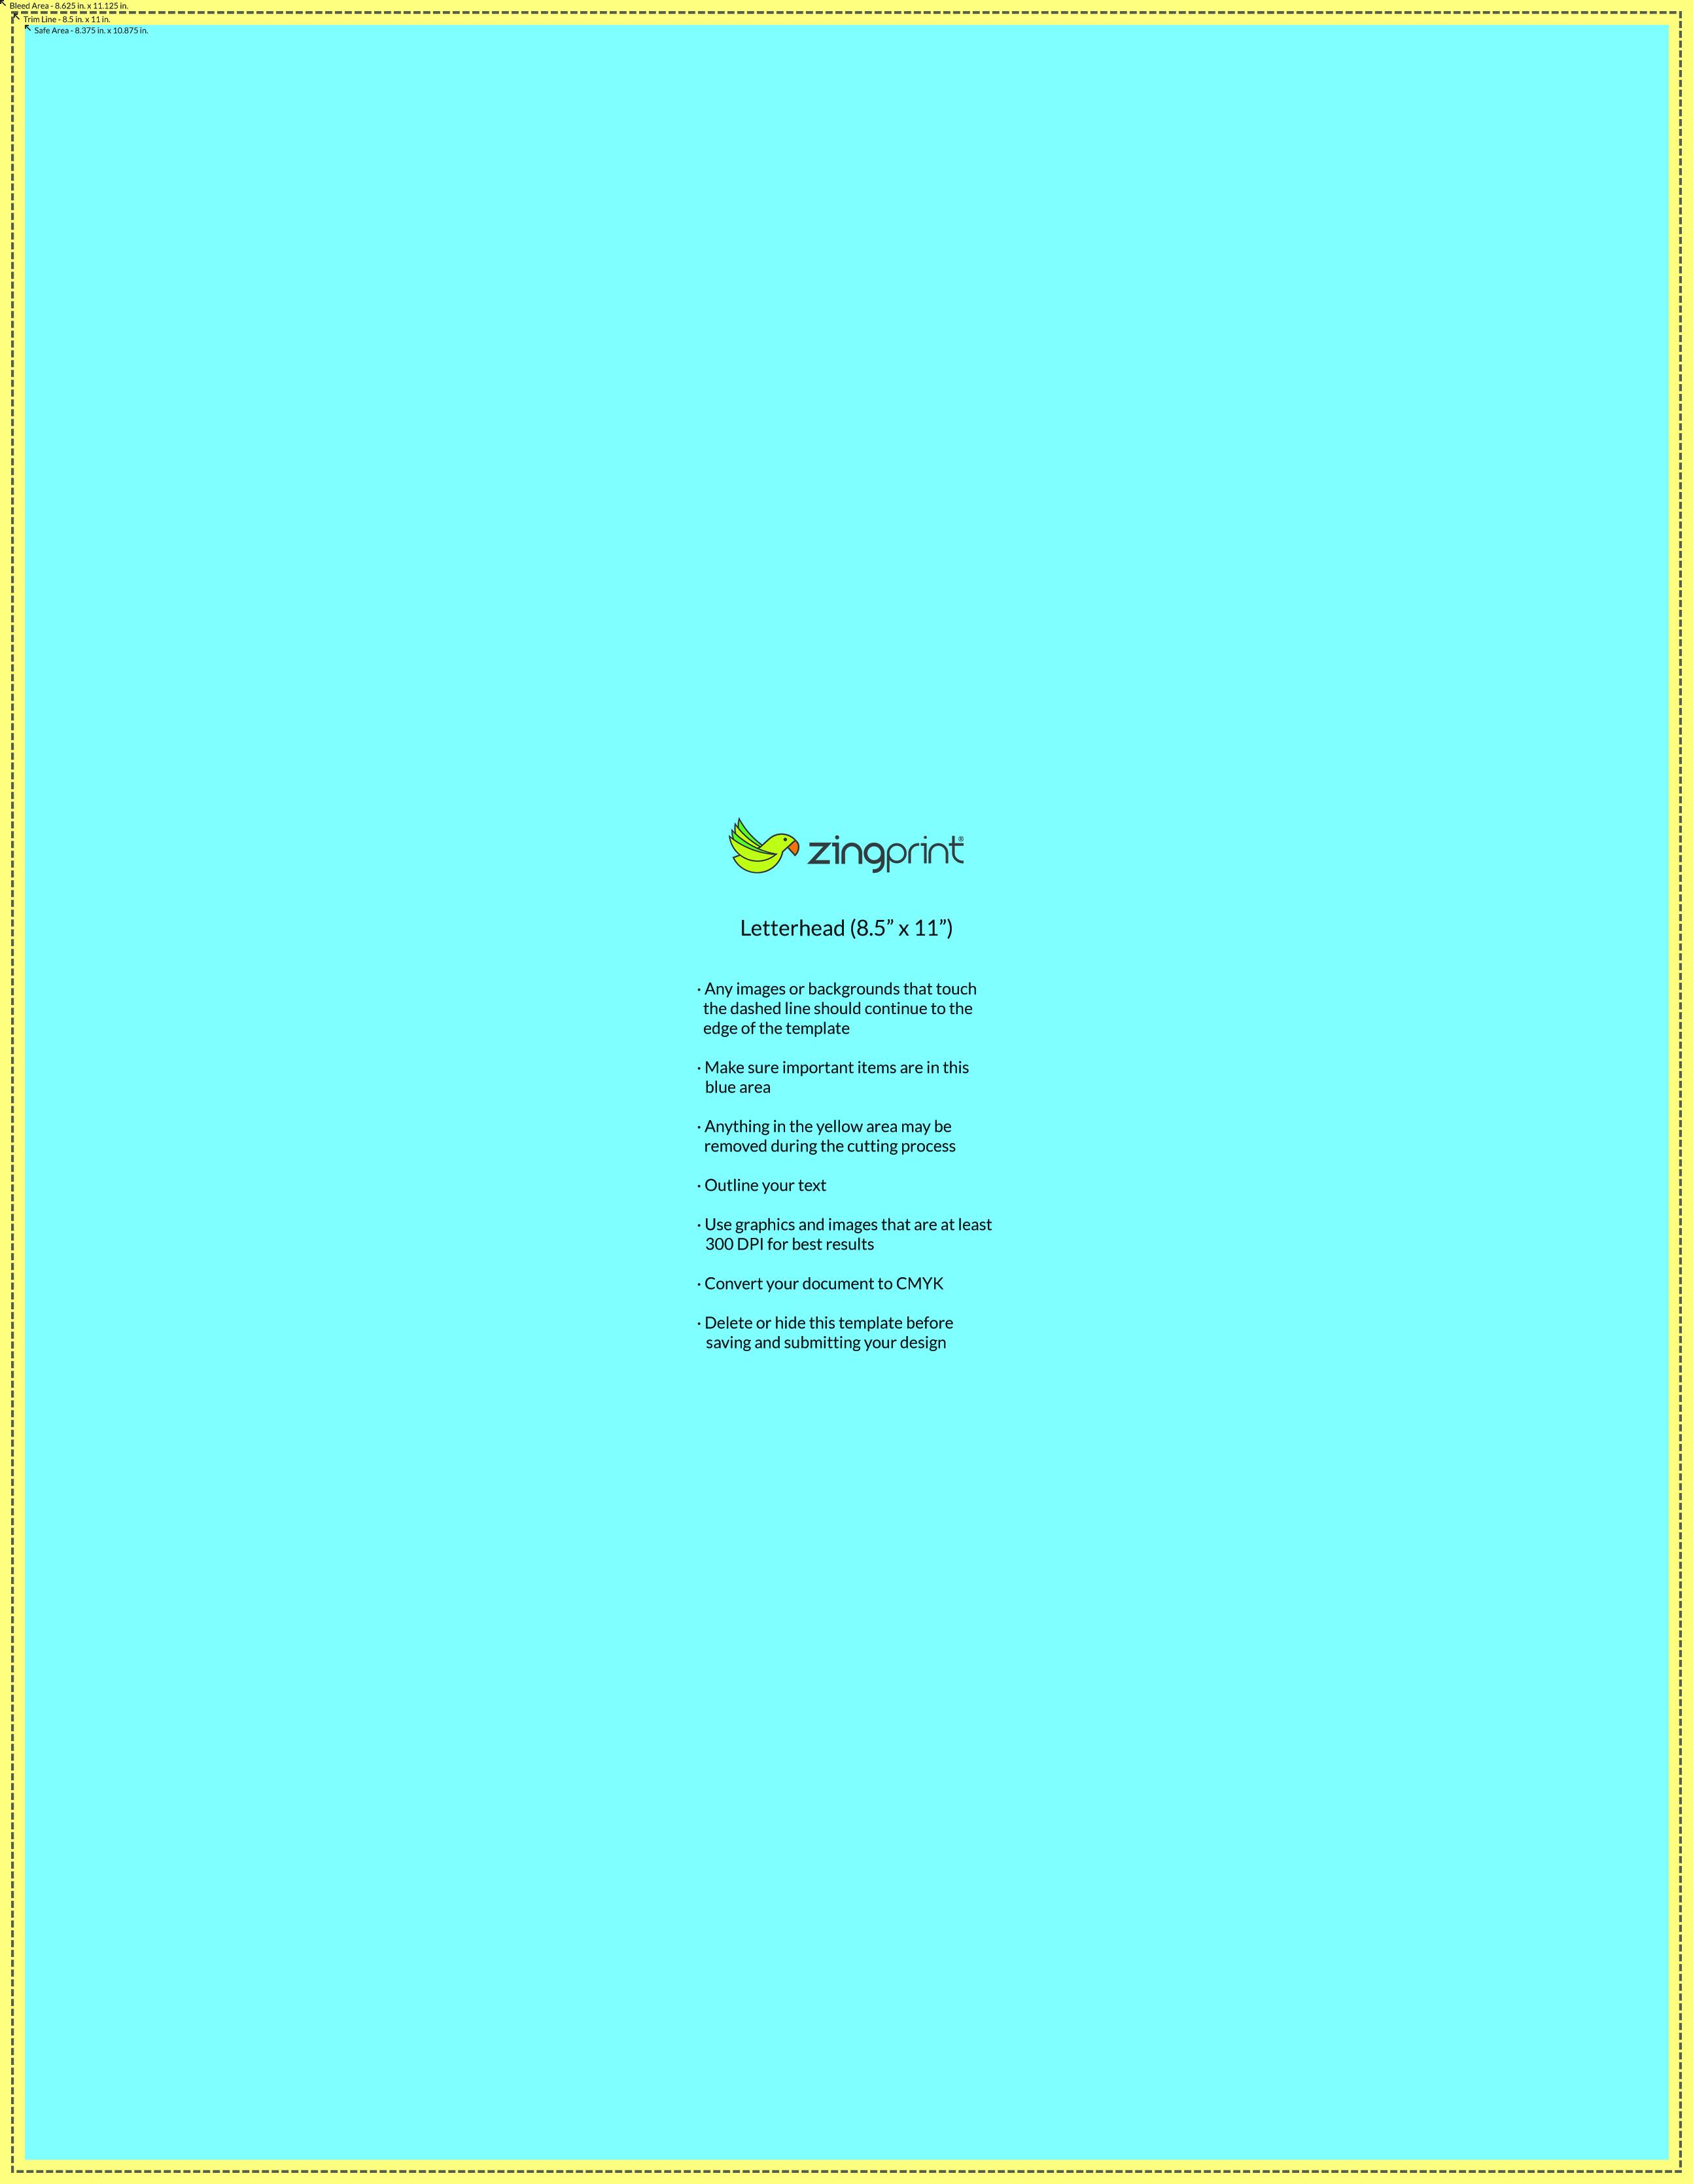 Templates zingprint letterhead spiritdancerdesigns Choice Image